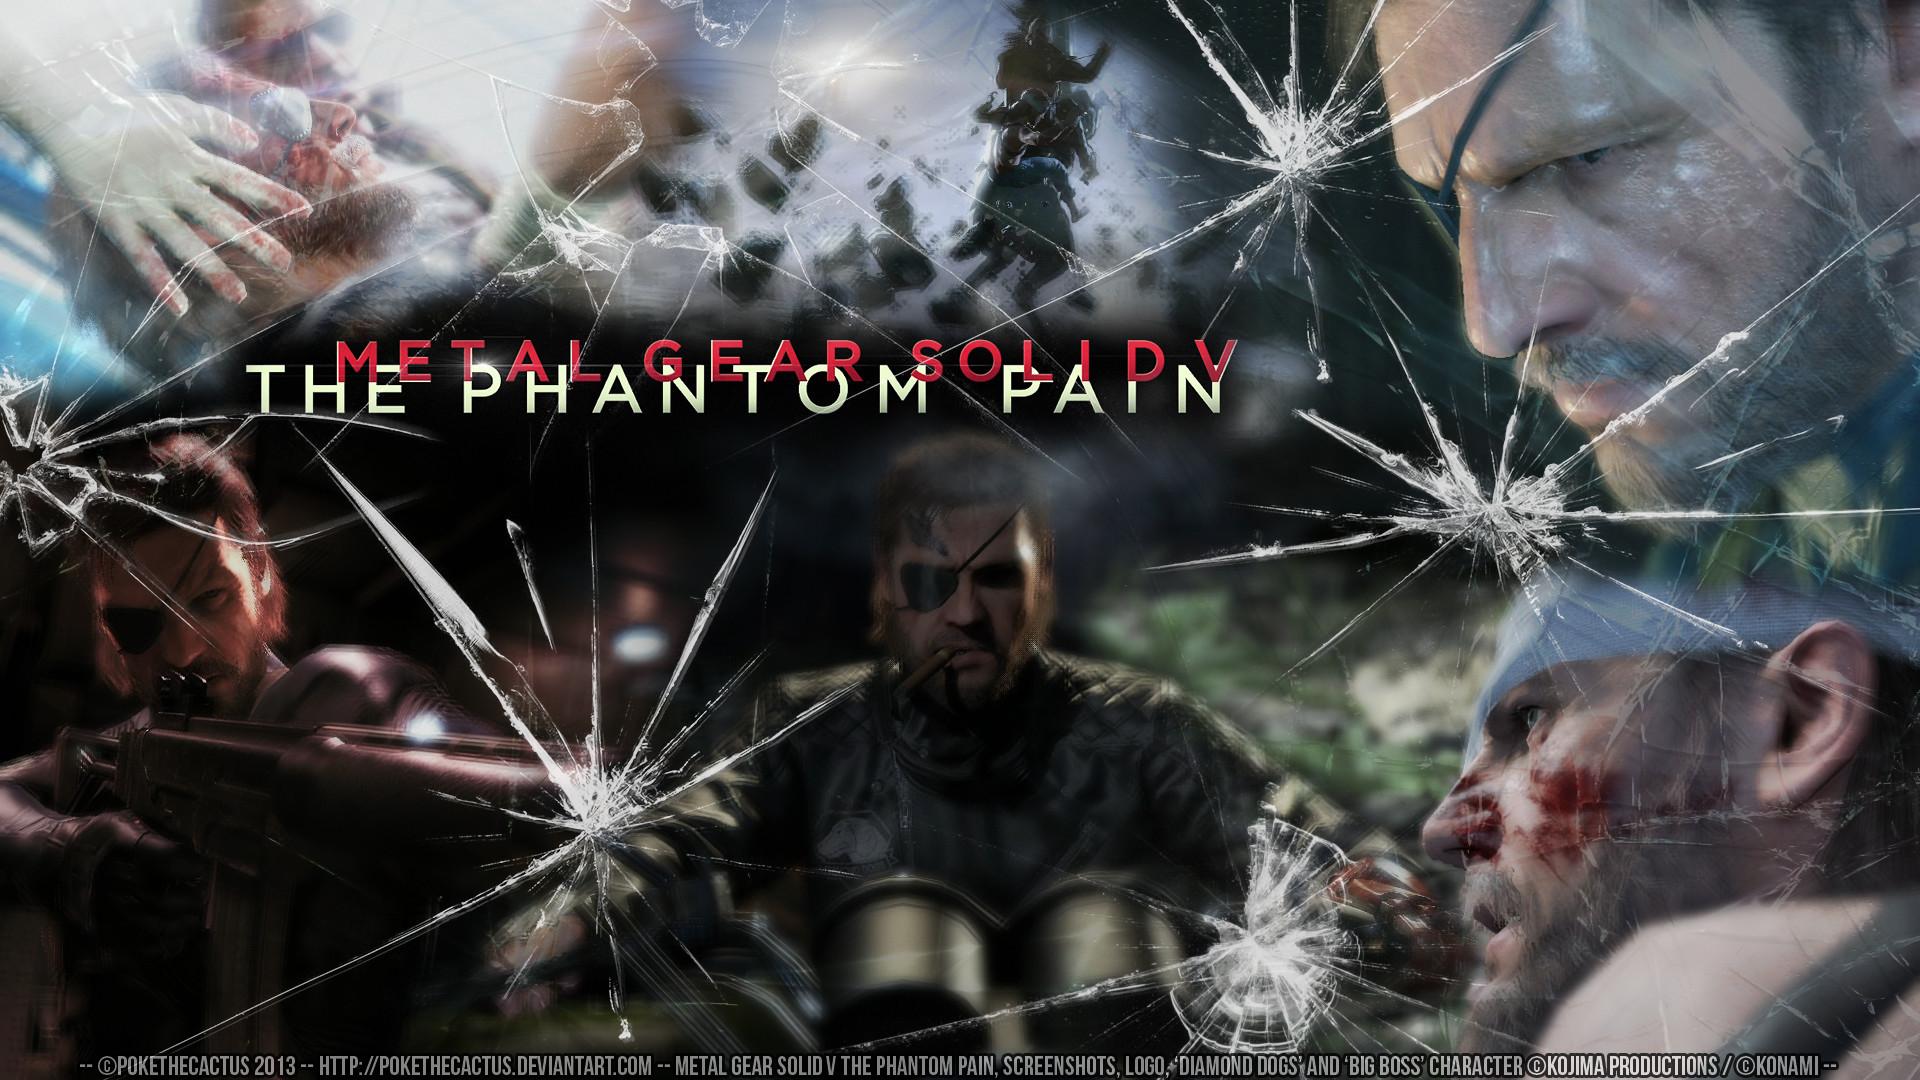 … Metal Gear Solid V The Phantom Pain Wallpaper – by PokeTheCactus